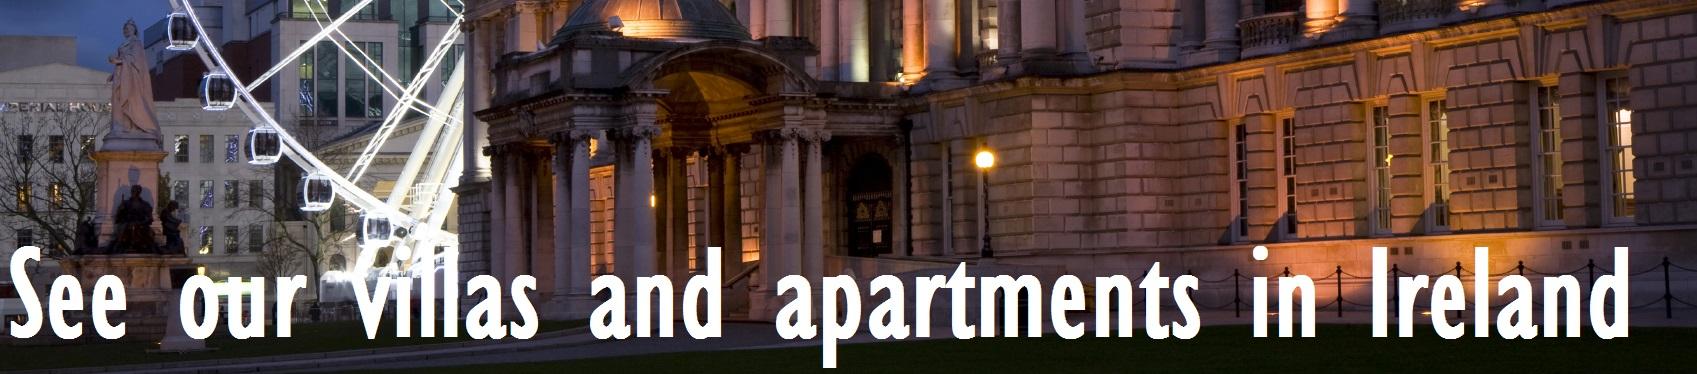 Villas and apartments in Ireland